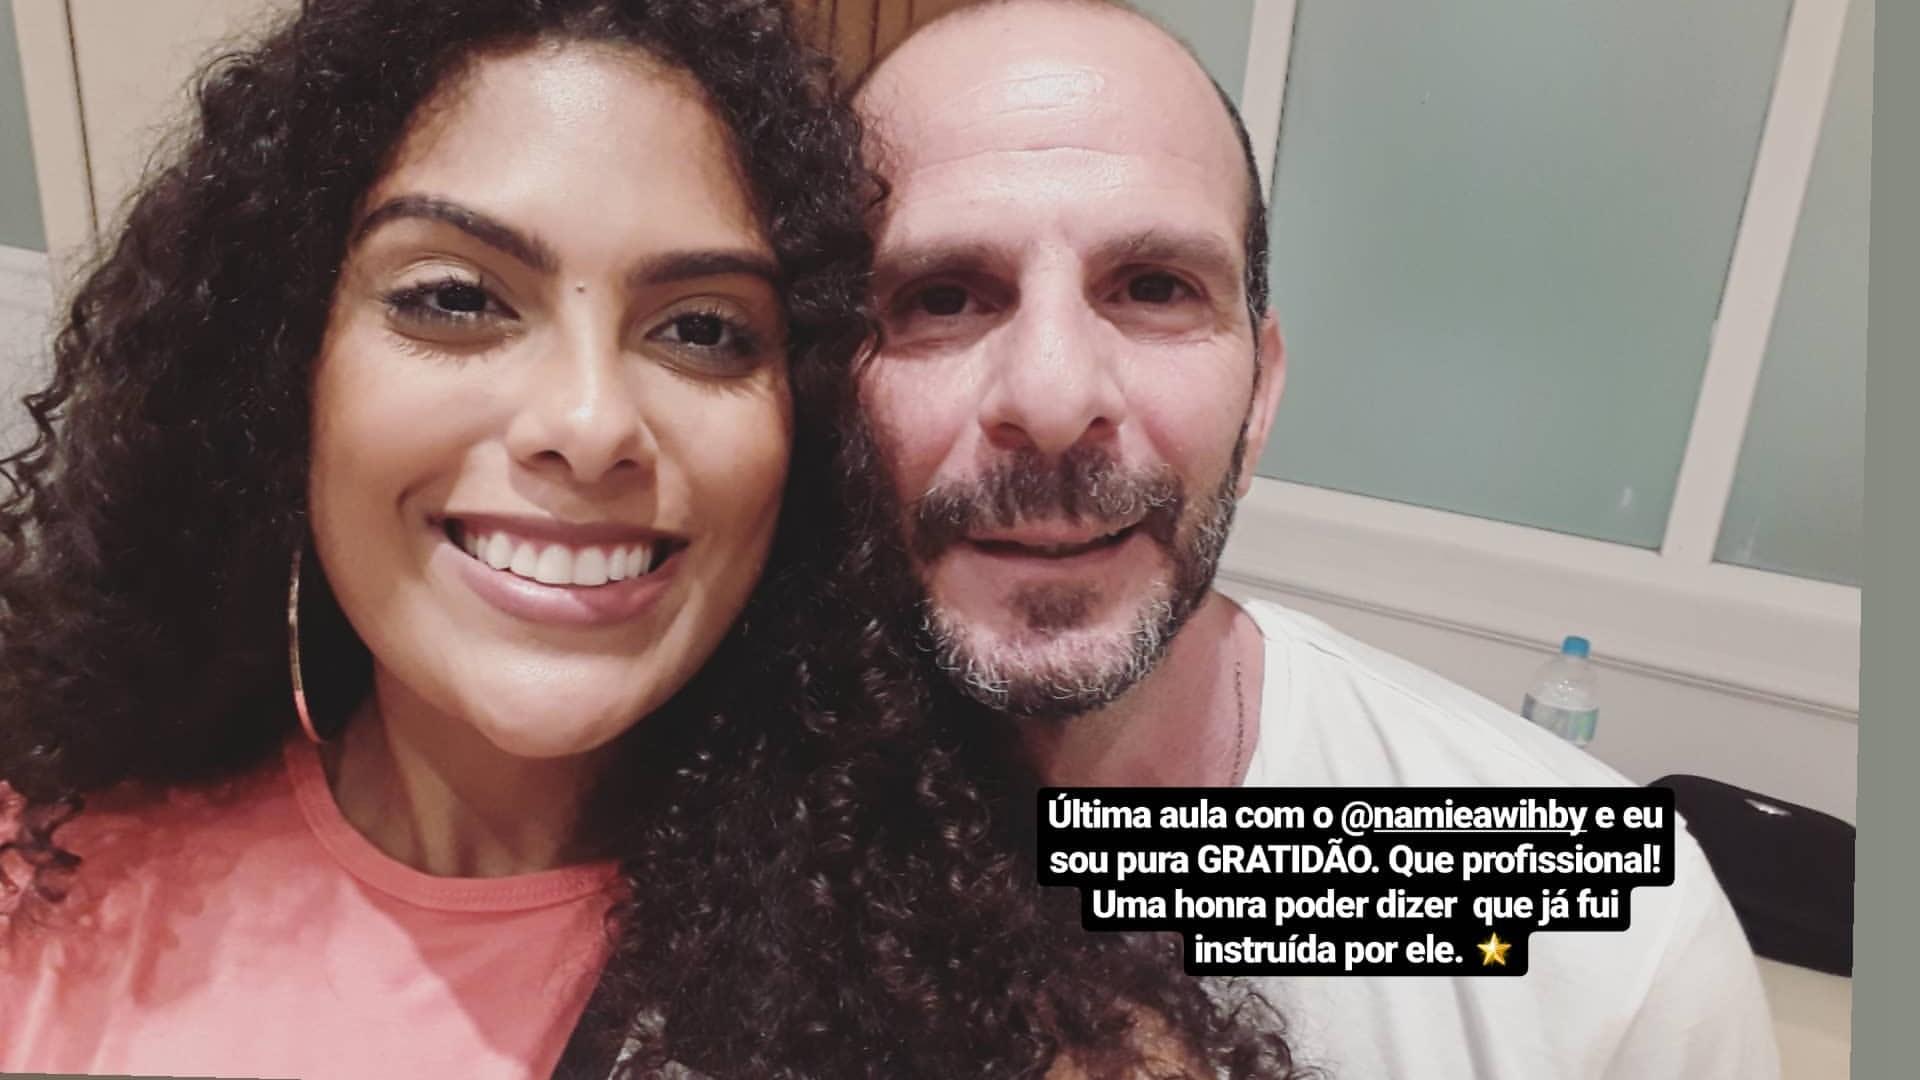 alessandra almeida, miss tocantins 2019. - Página 5 52857811